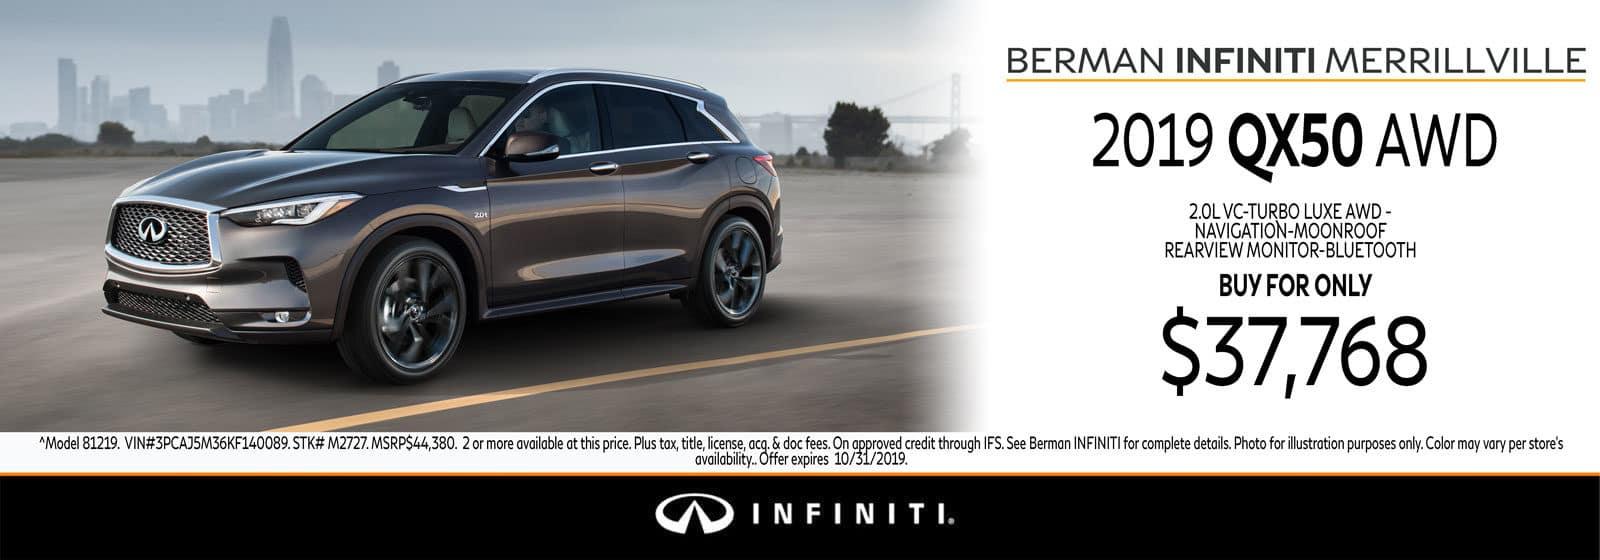 New 2019 INFINITI QX50 October Offer at Berman INFINITI of Merrillville!